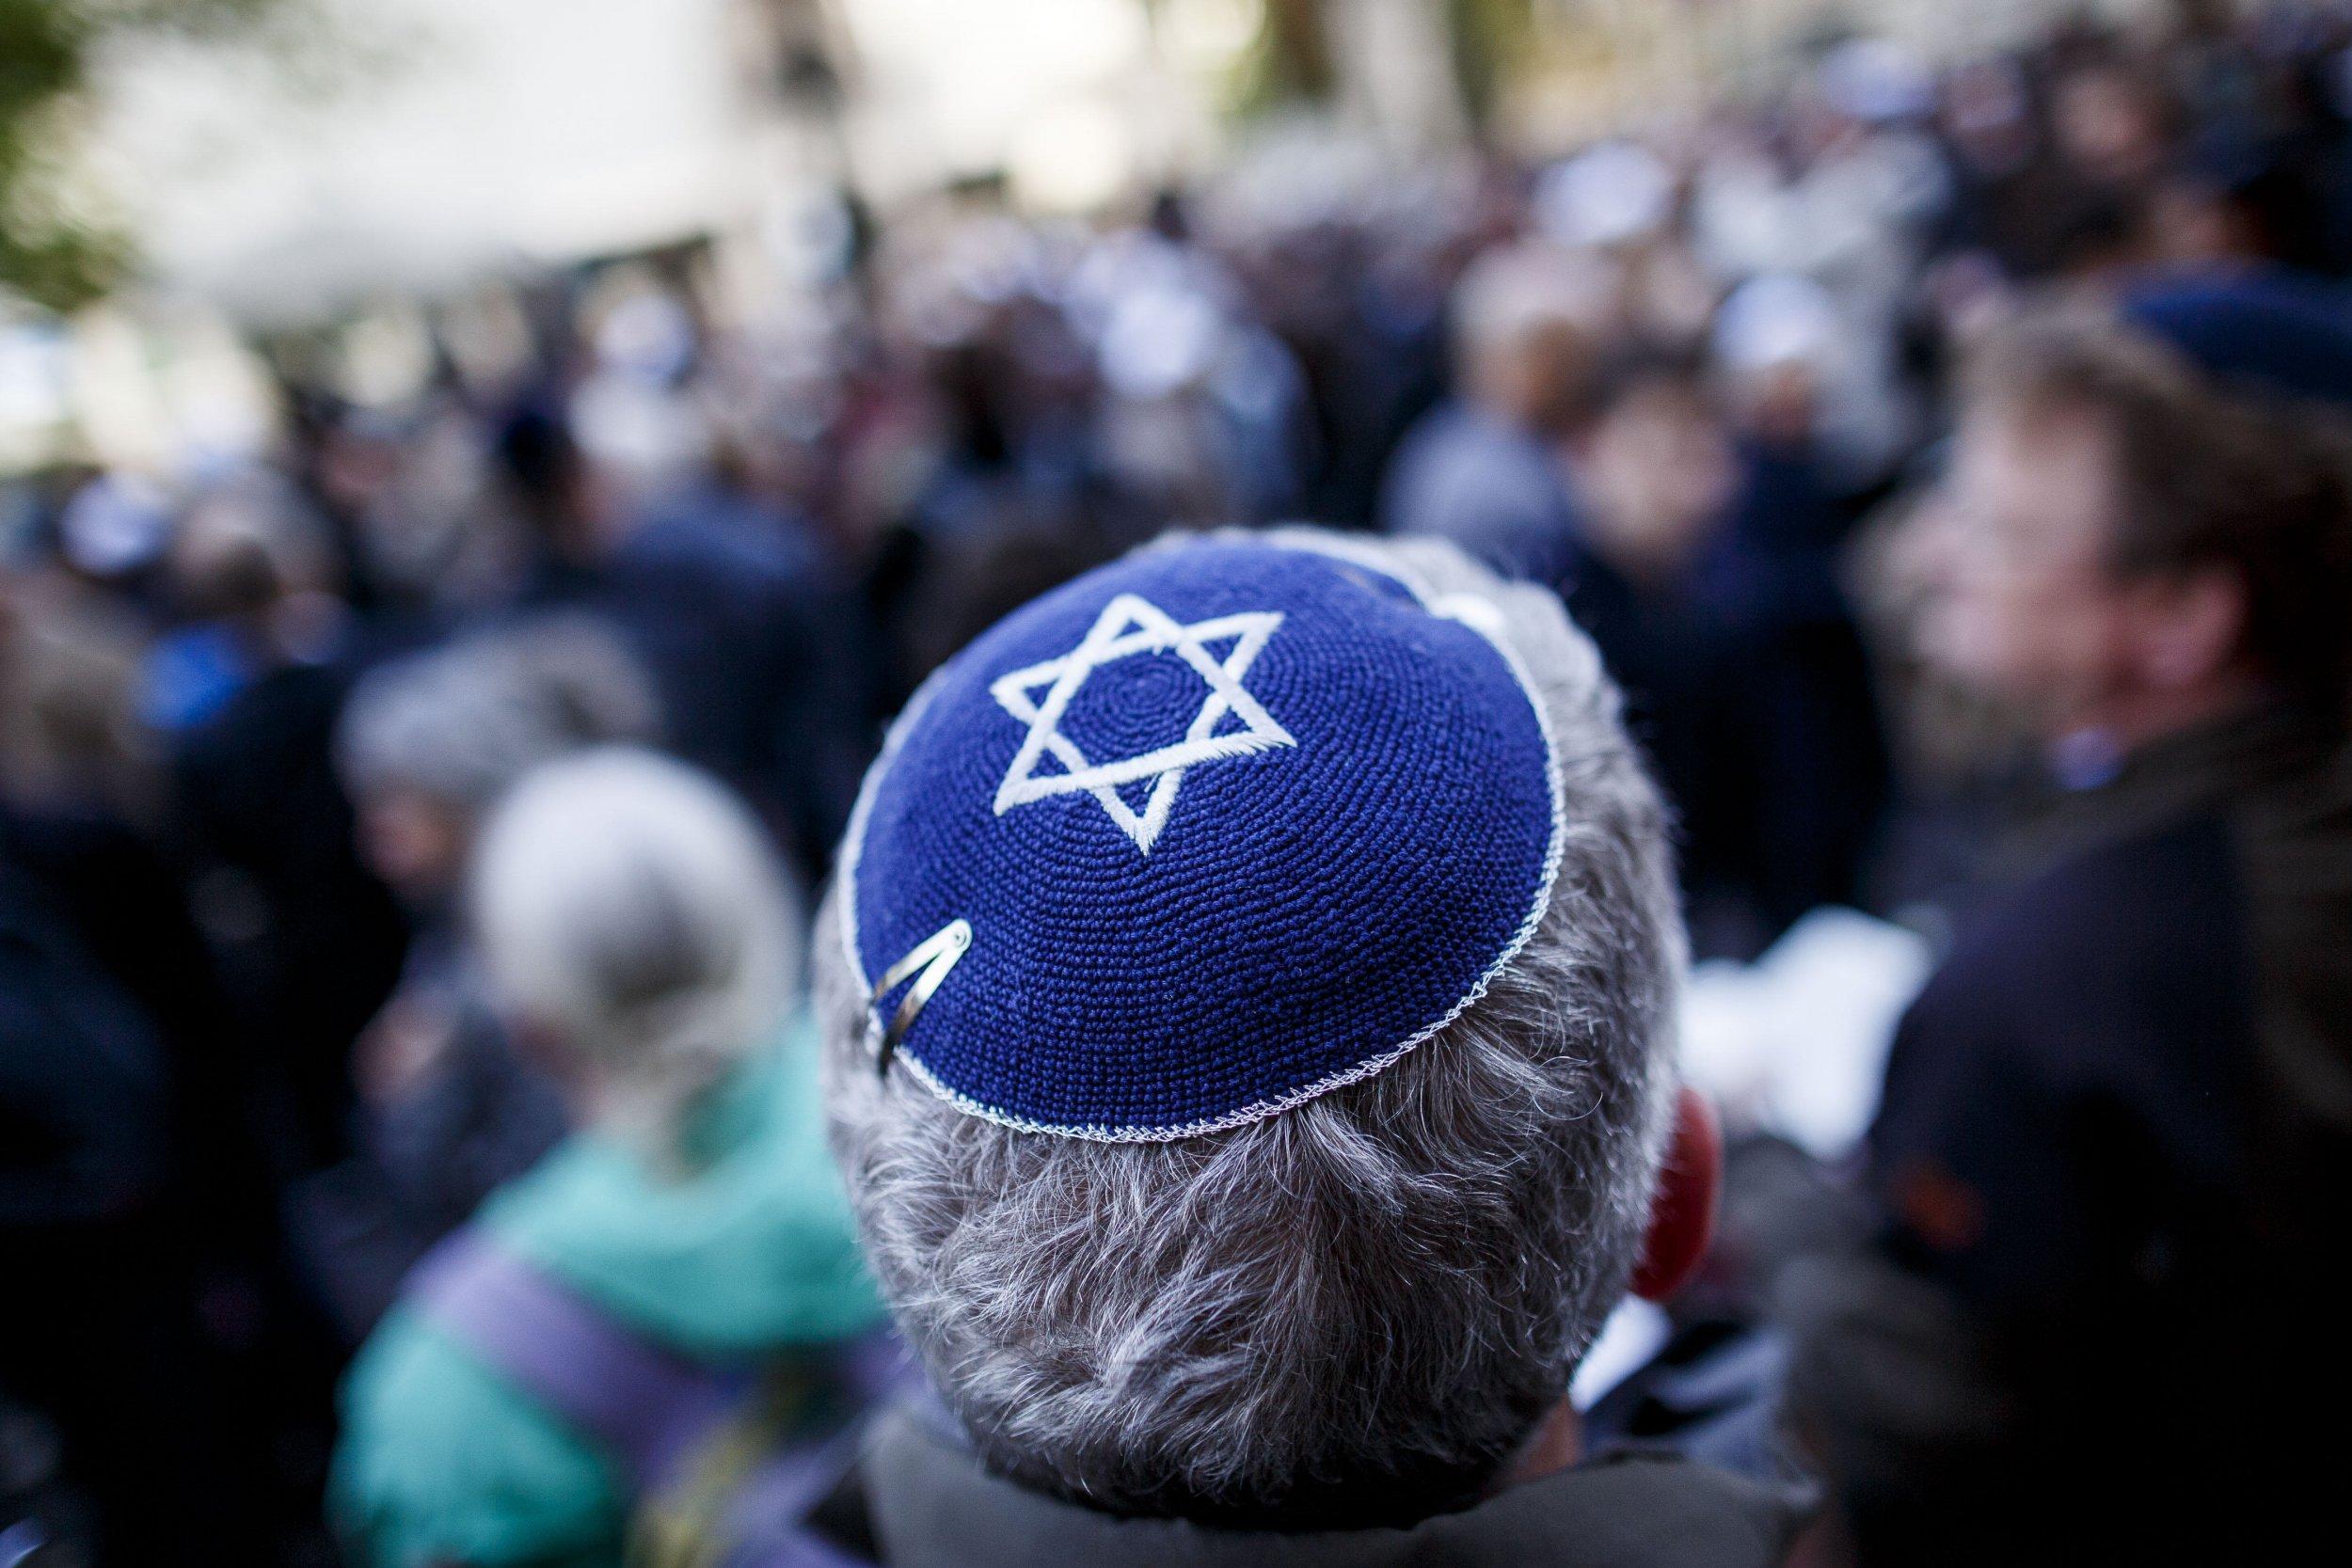 Kippah far-right Poland anti-semitism debate